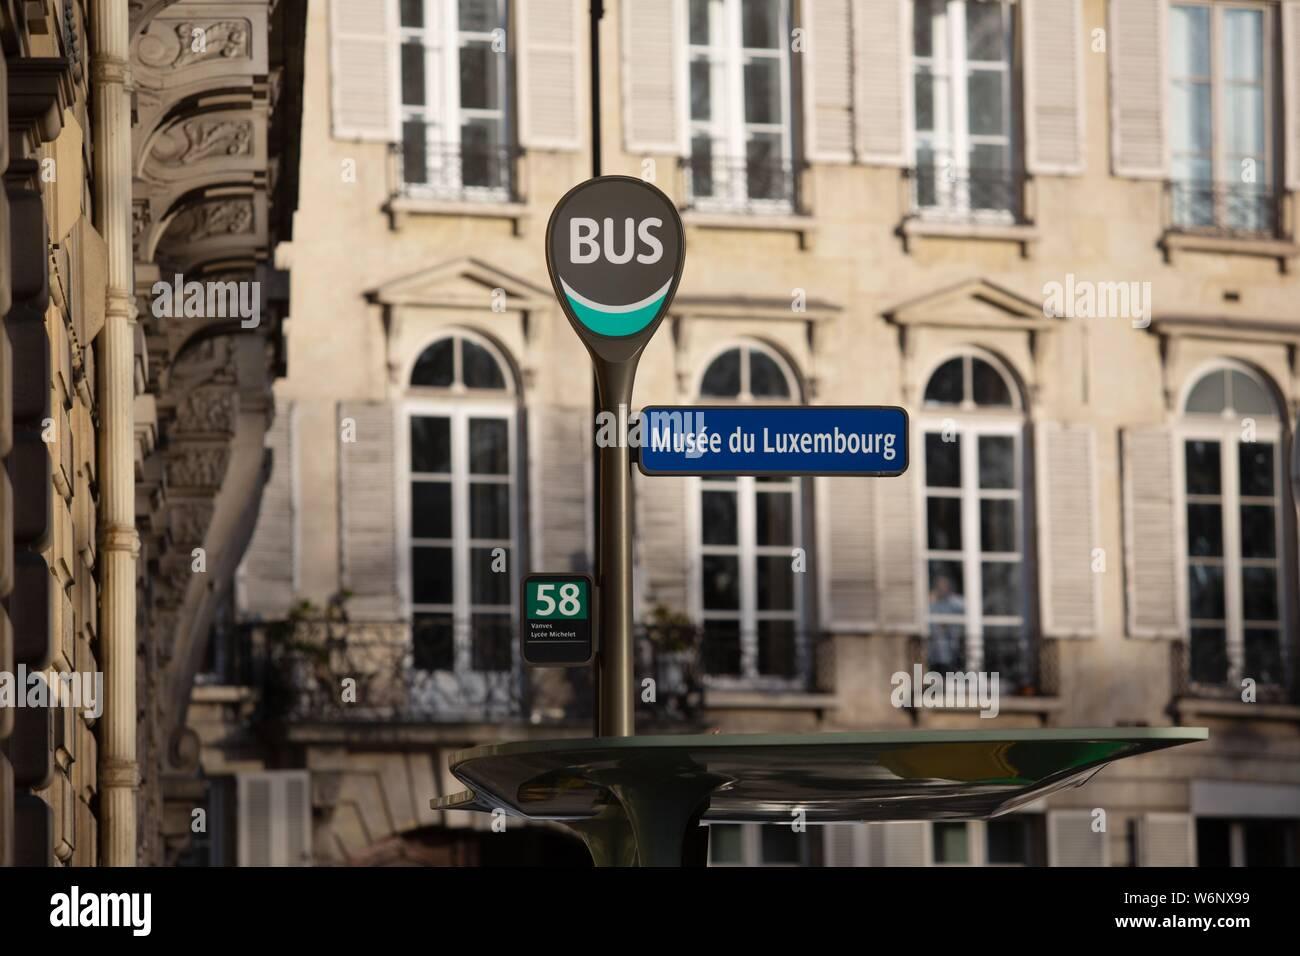 Paris 6th arrondissement, Rue Guynemer, bus station Stock Photo